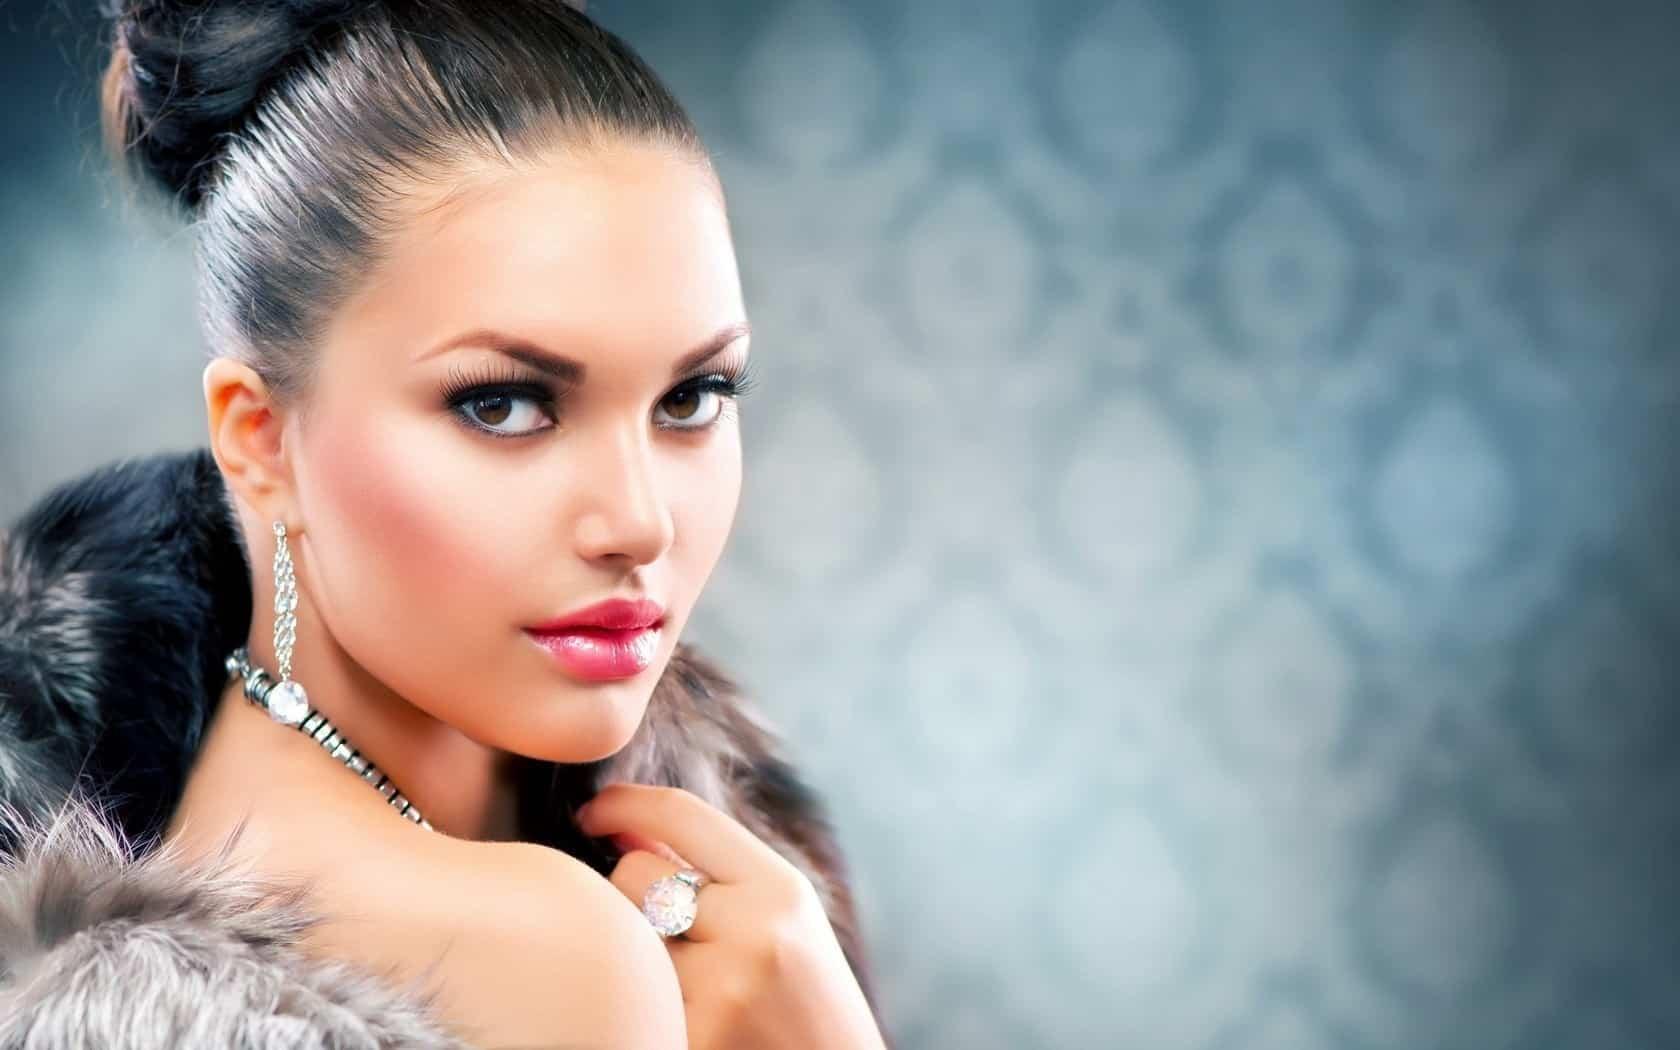 7023352-makeup-beauty-brunette-woman-fashion